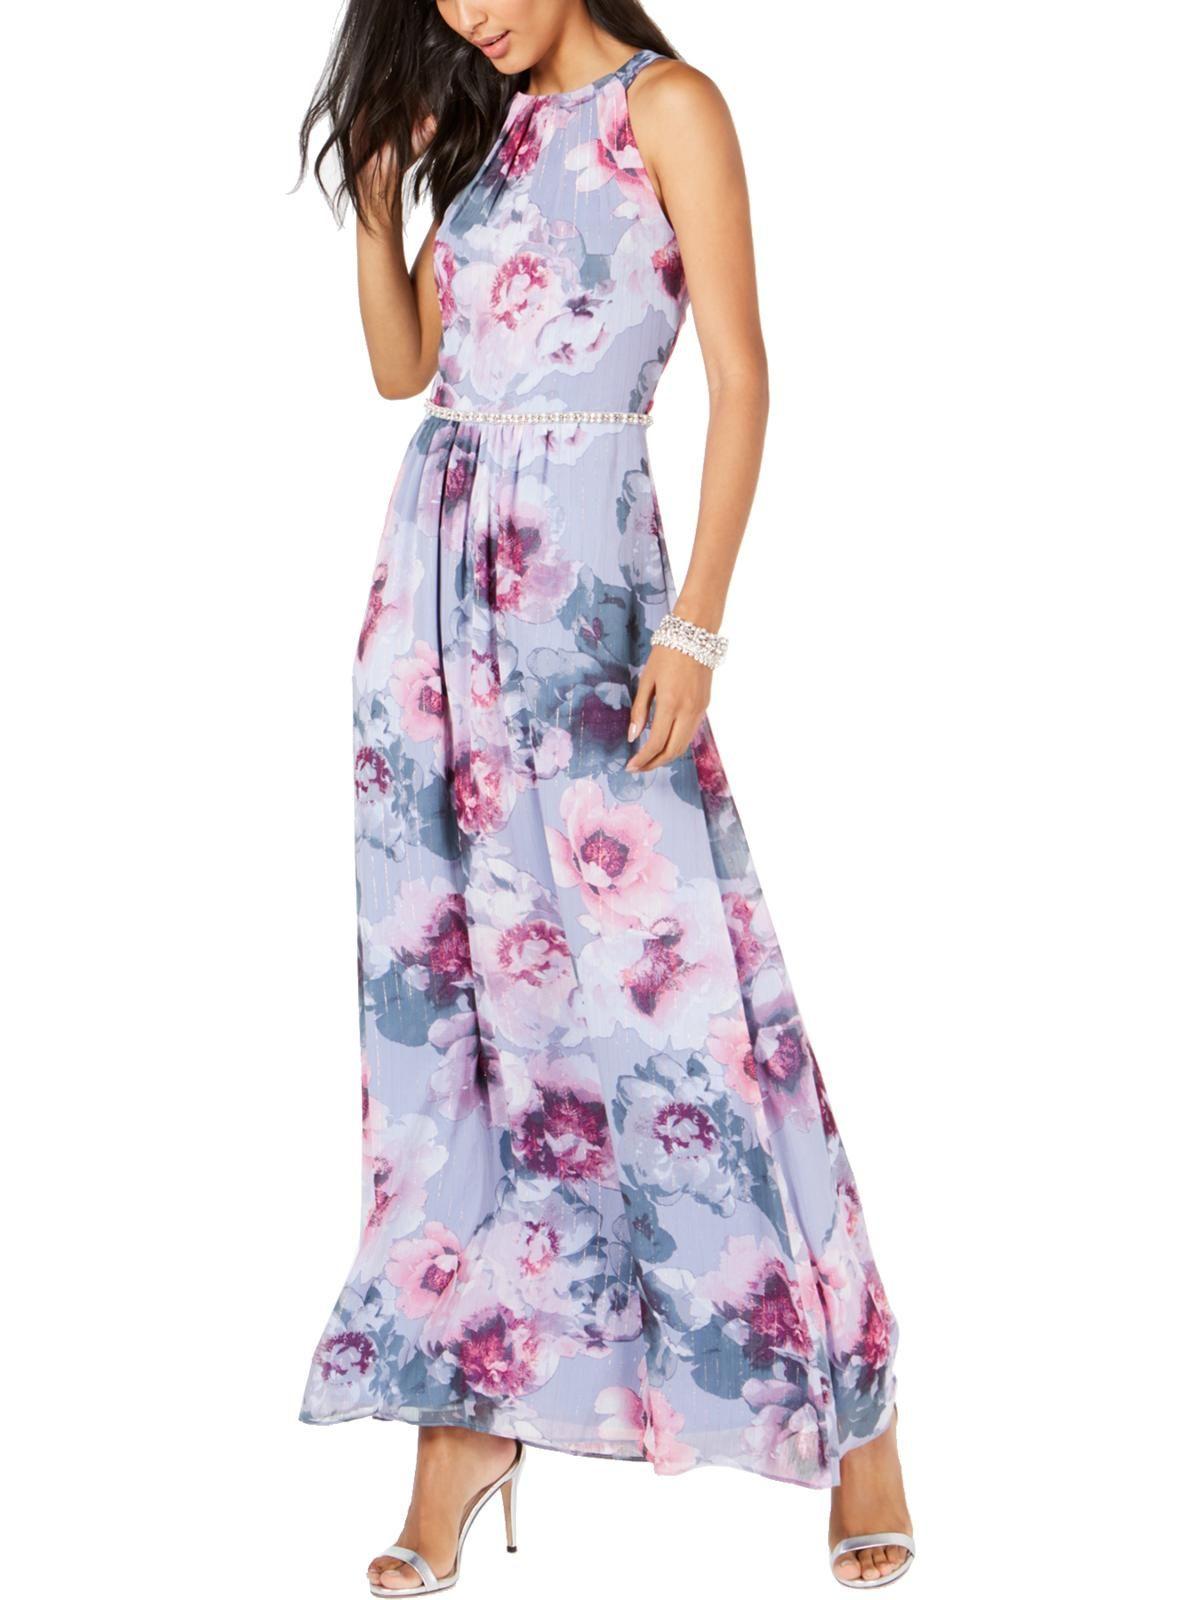 Slny Slny Womens Floral Embellished Evening Dress Walmart Com Sl Fashions Dresses Maxi Dress [ 1600 x 1200 Pixel ]